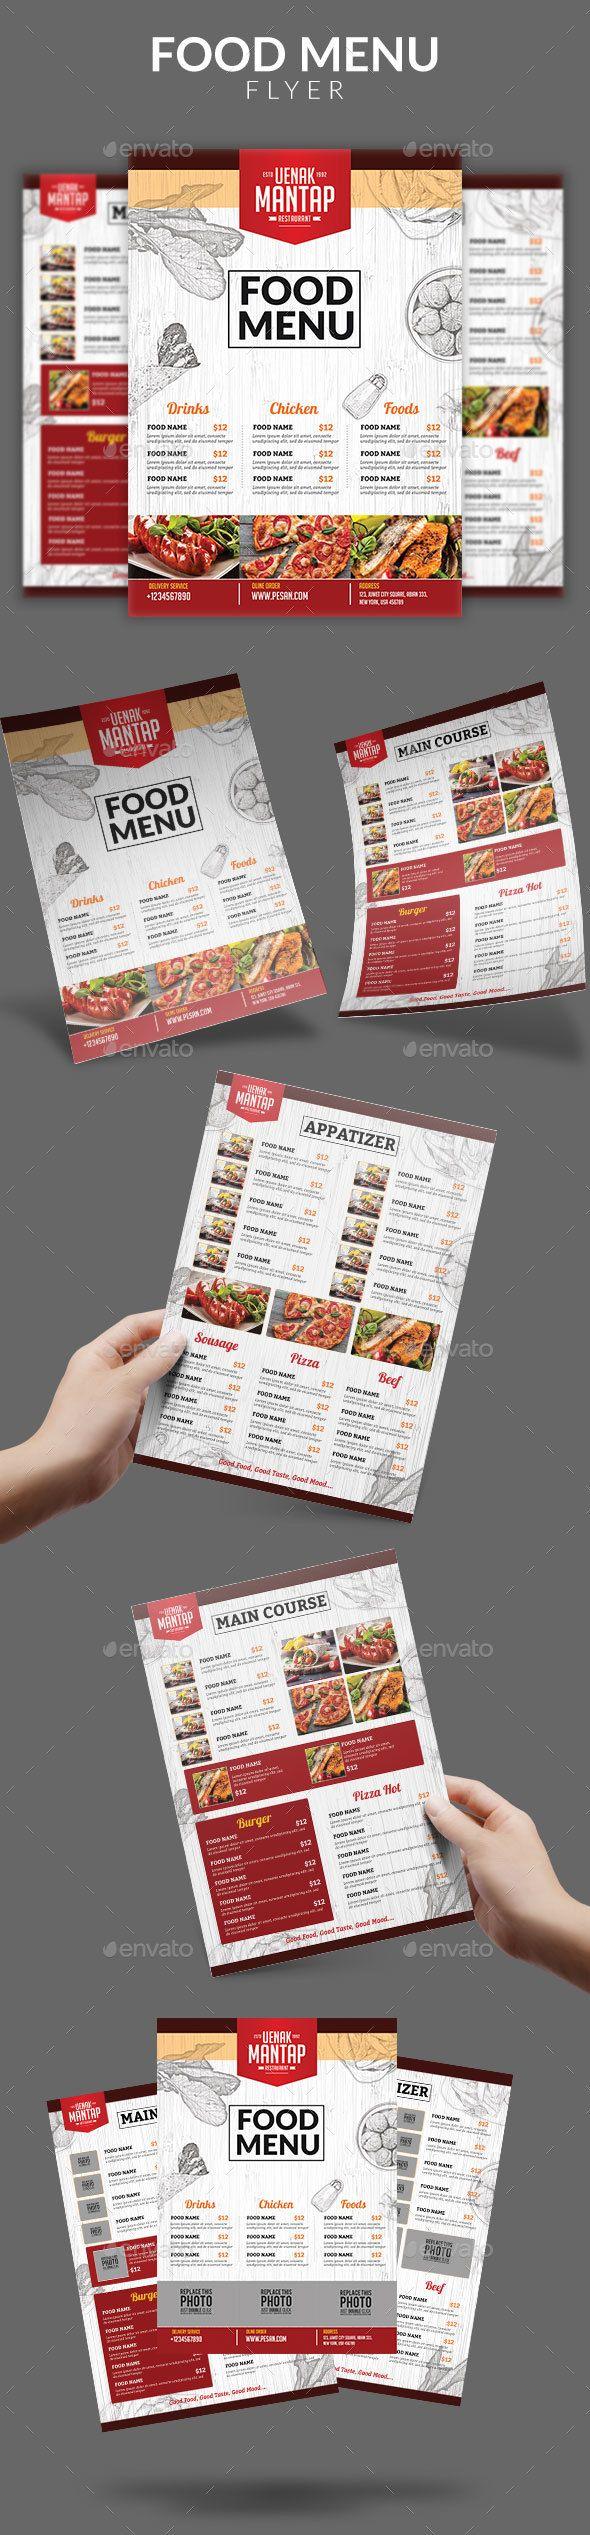 Restaurant Food Menu Pinterest Grilled Hamburgers Lunch Menu - Creative menu design templates